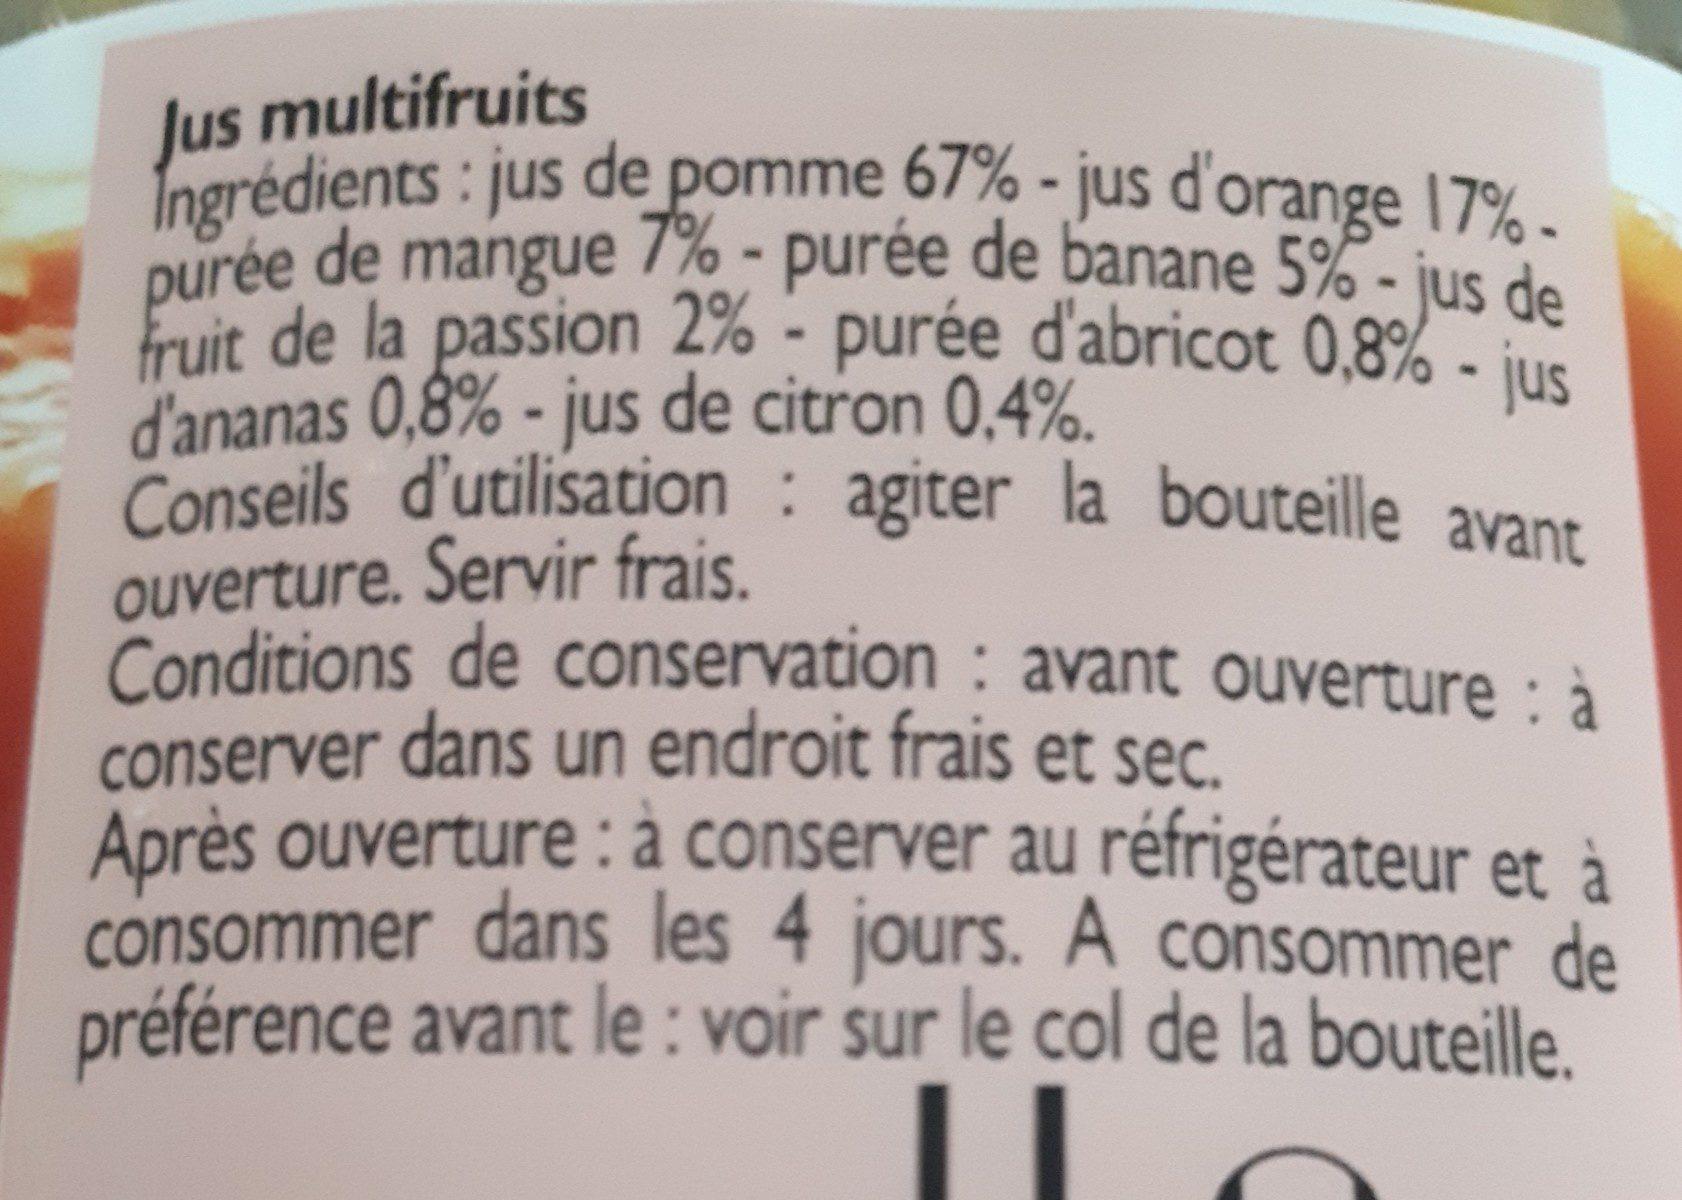 Pur jus multifruits - Ingrédients